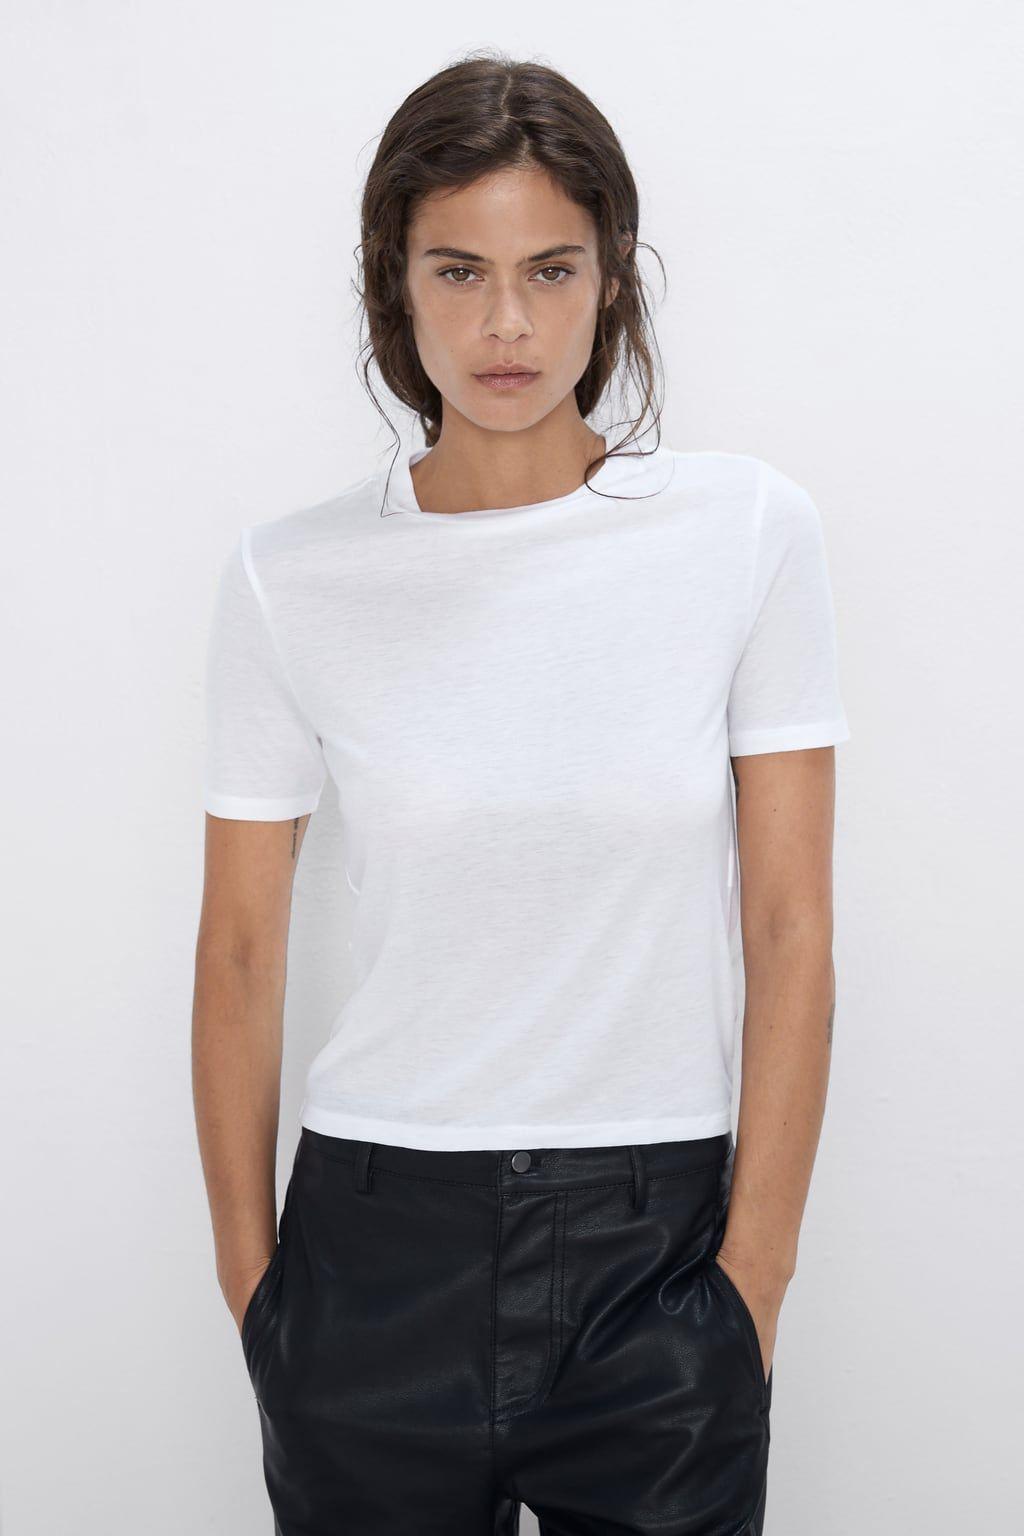 Camiseta Cuello Perkins Básicos Camisetas Mujer Zara España Mock Neck Top Sleeveless Tshirt Women